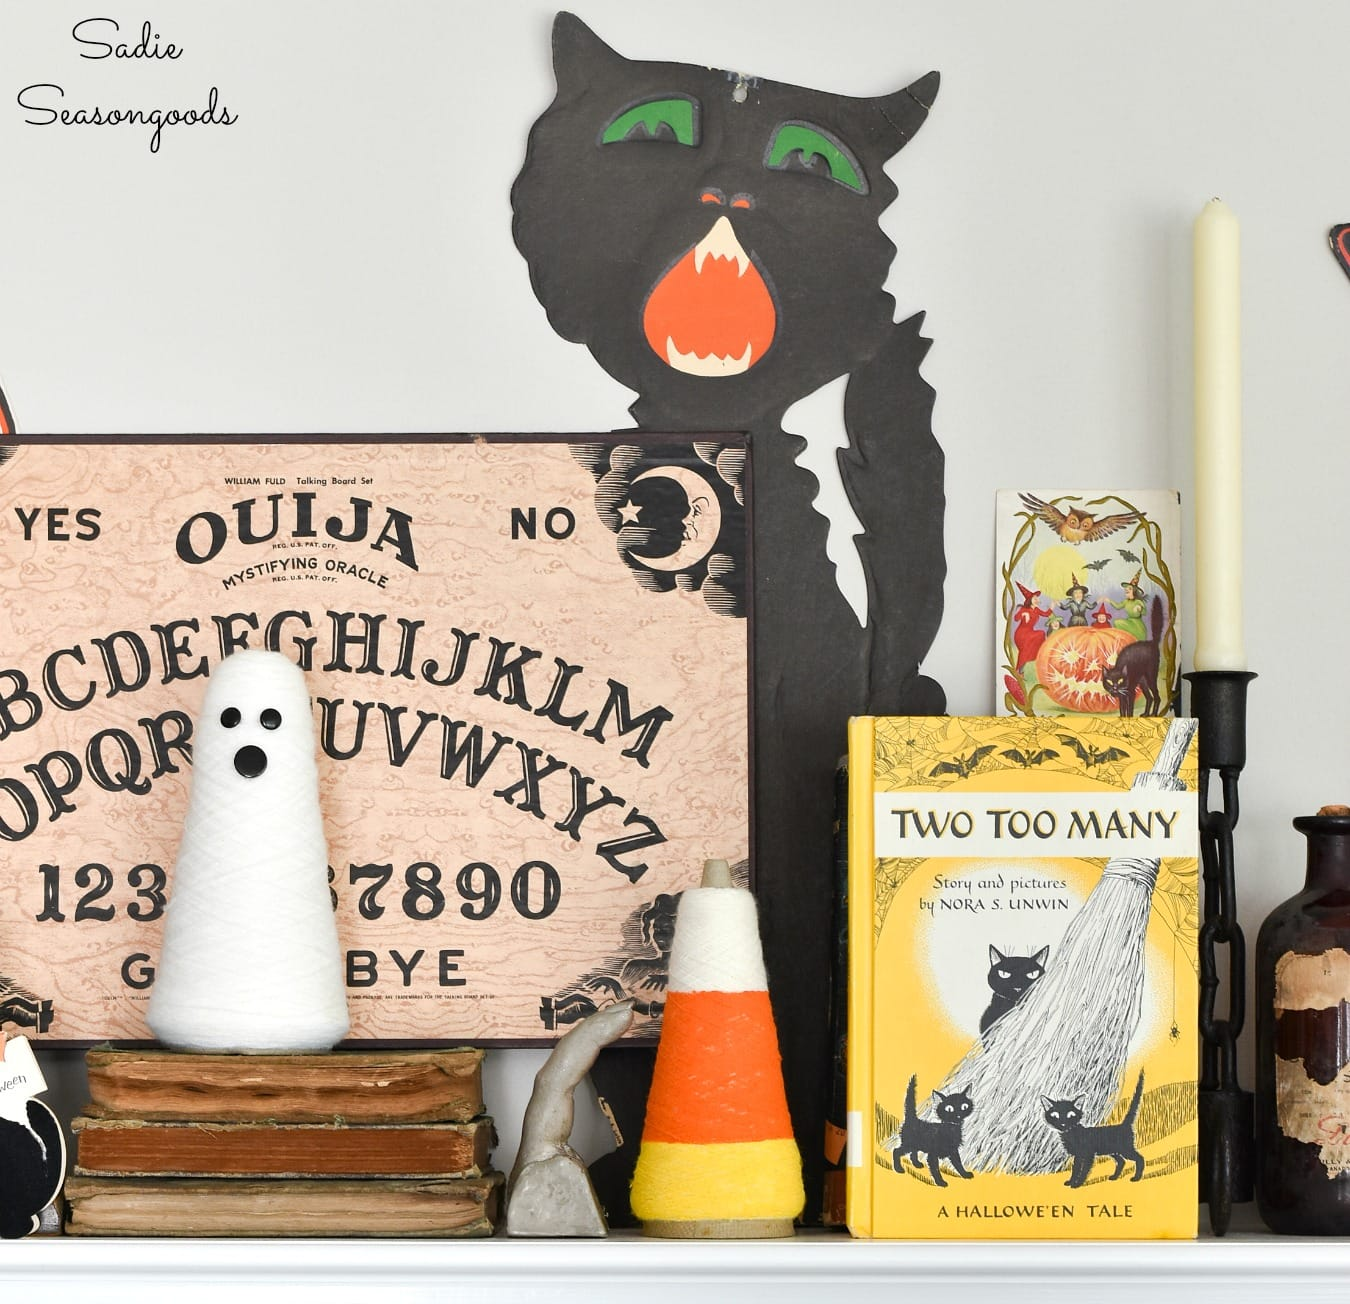 Vintage Halloween decor with children's Halloween books